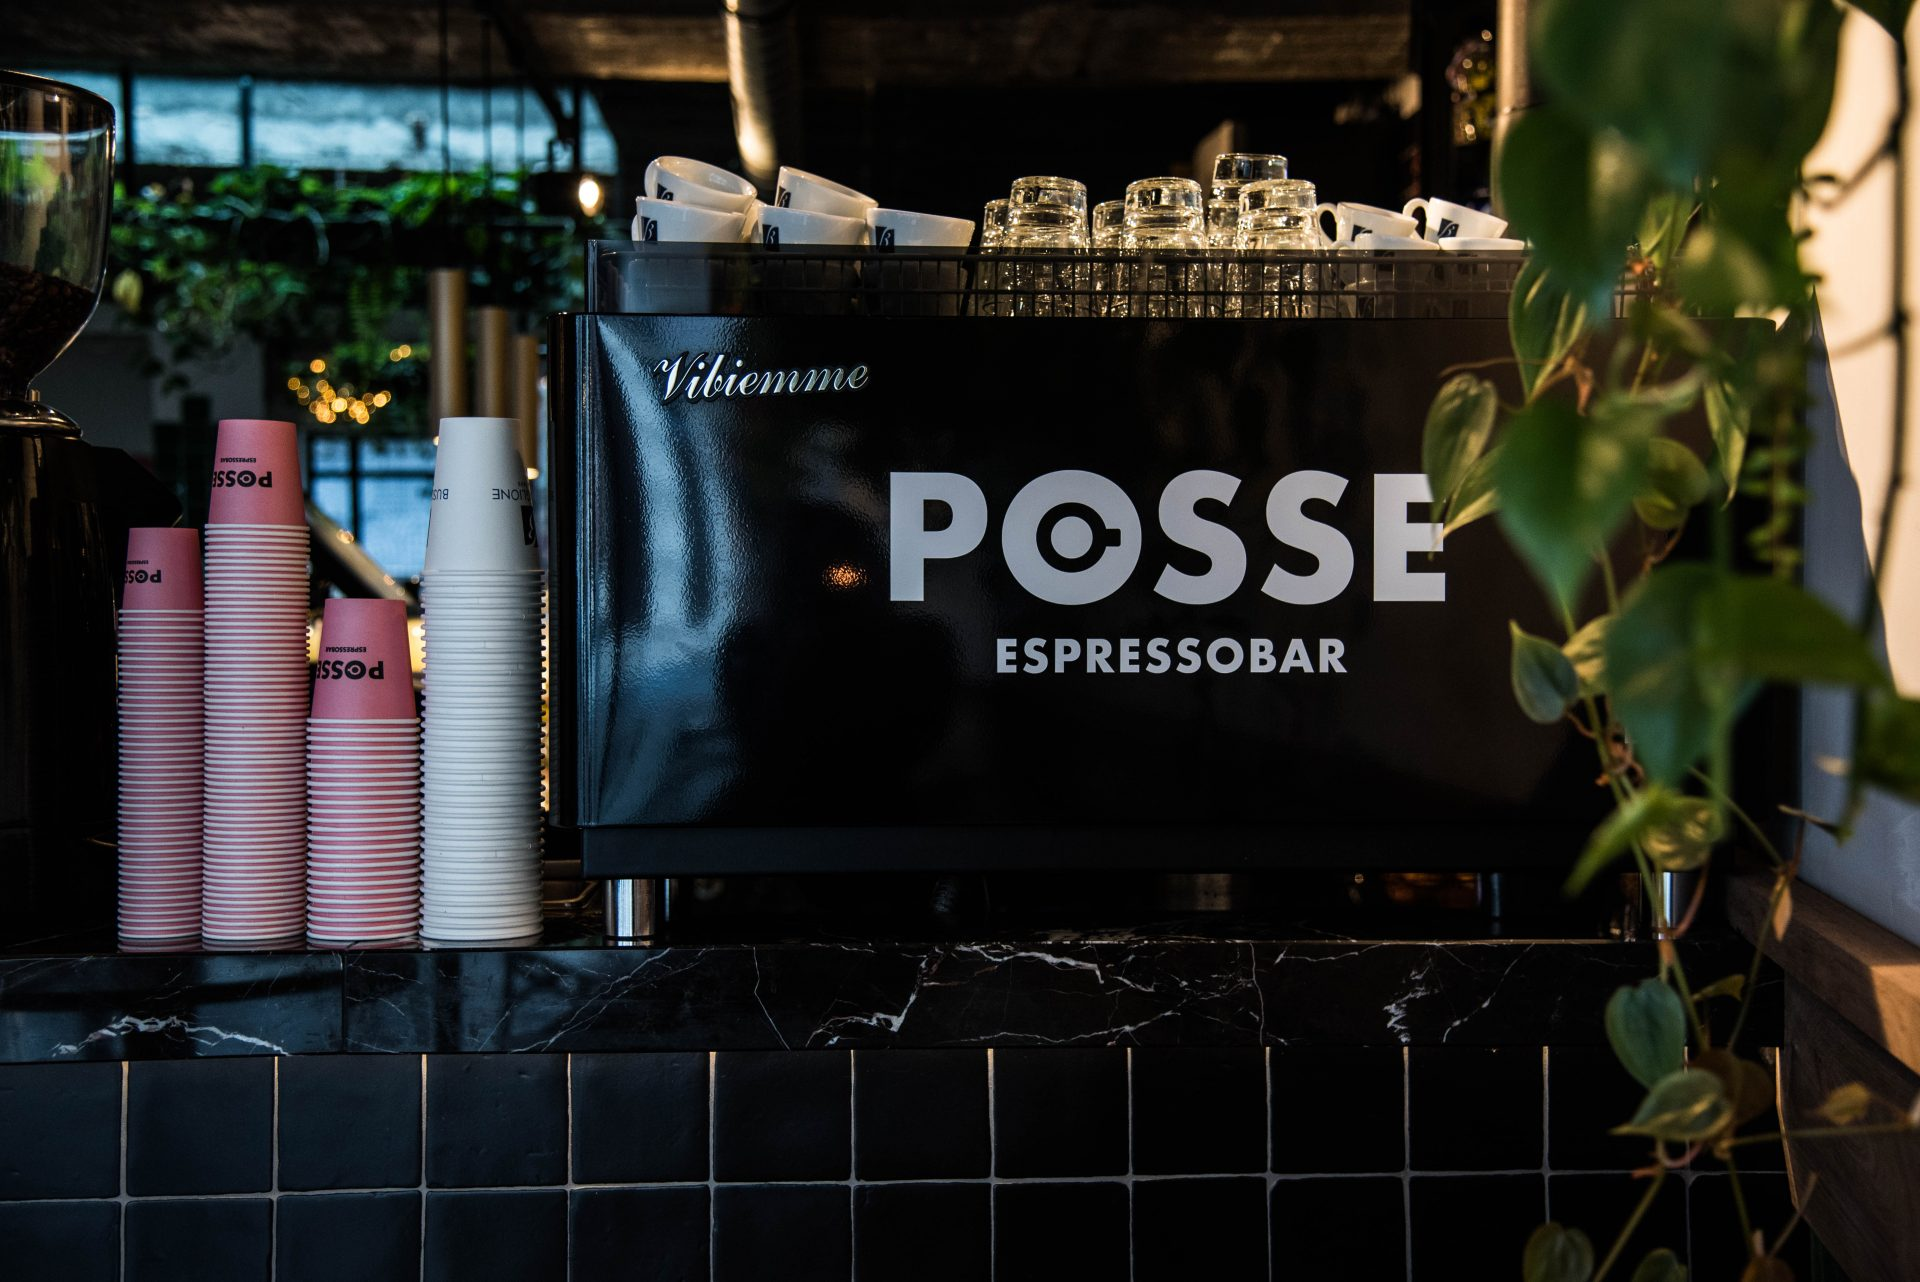 Posse Espressobar in Arnhem